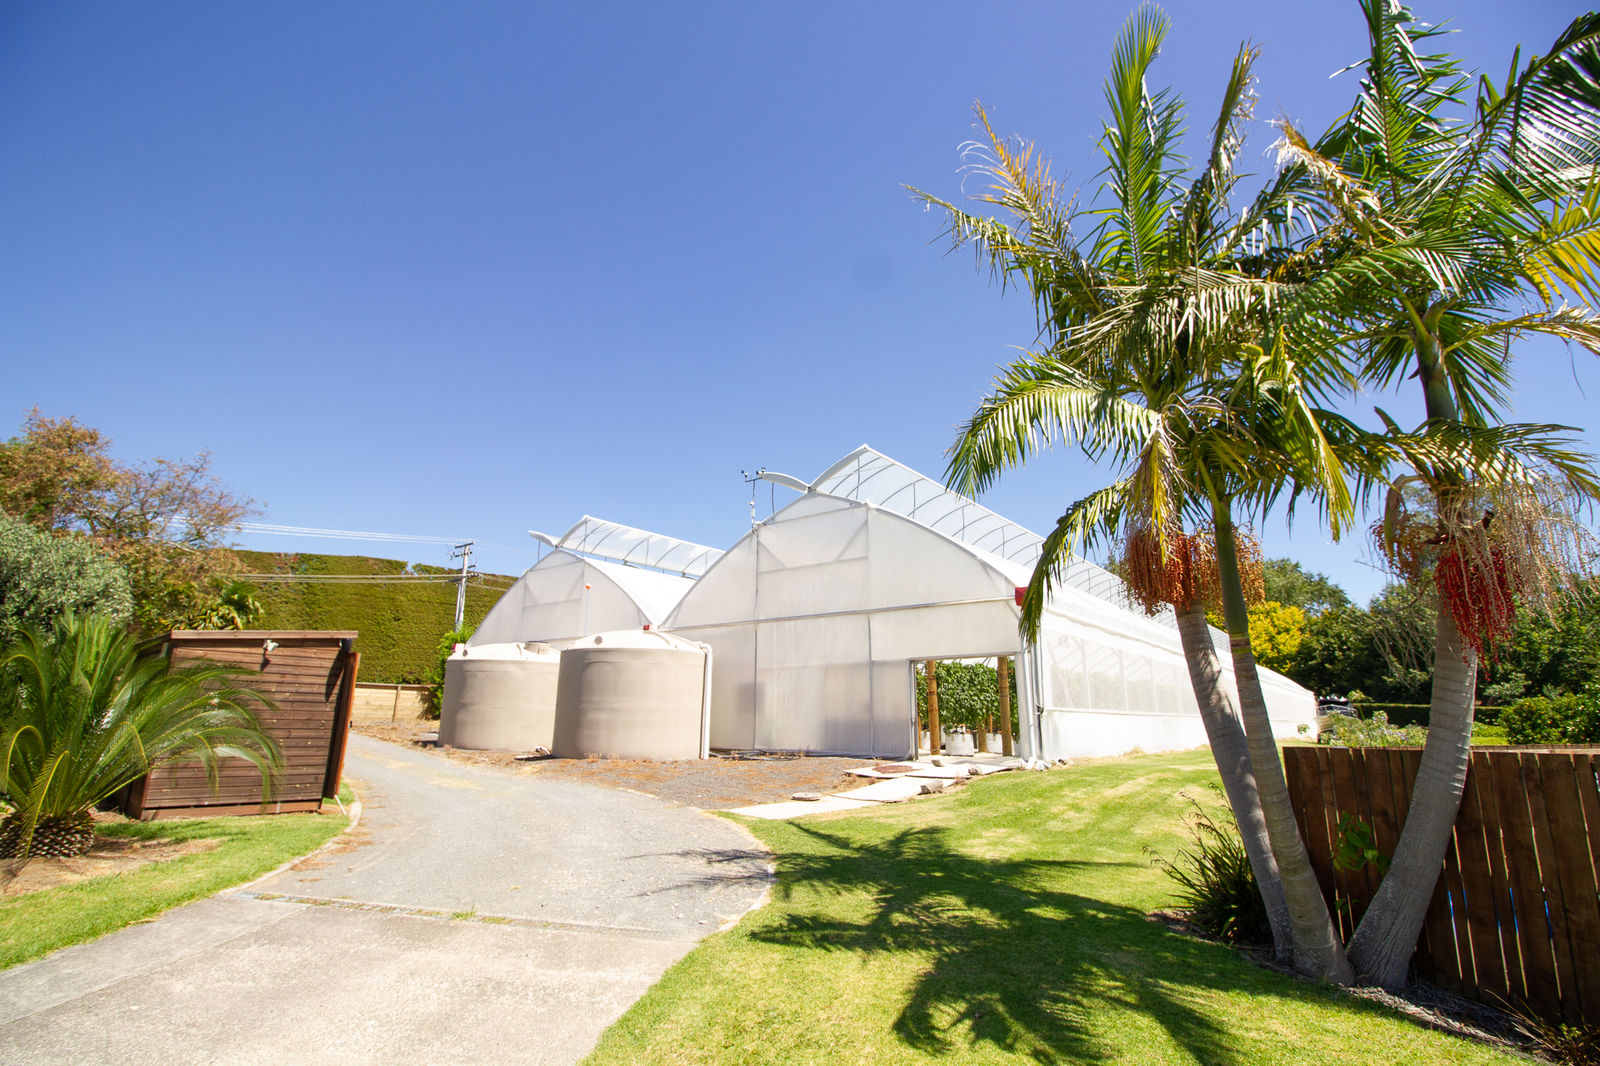 The CEA greenhouse at Scott Pilcher's farm